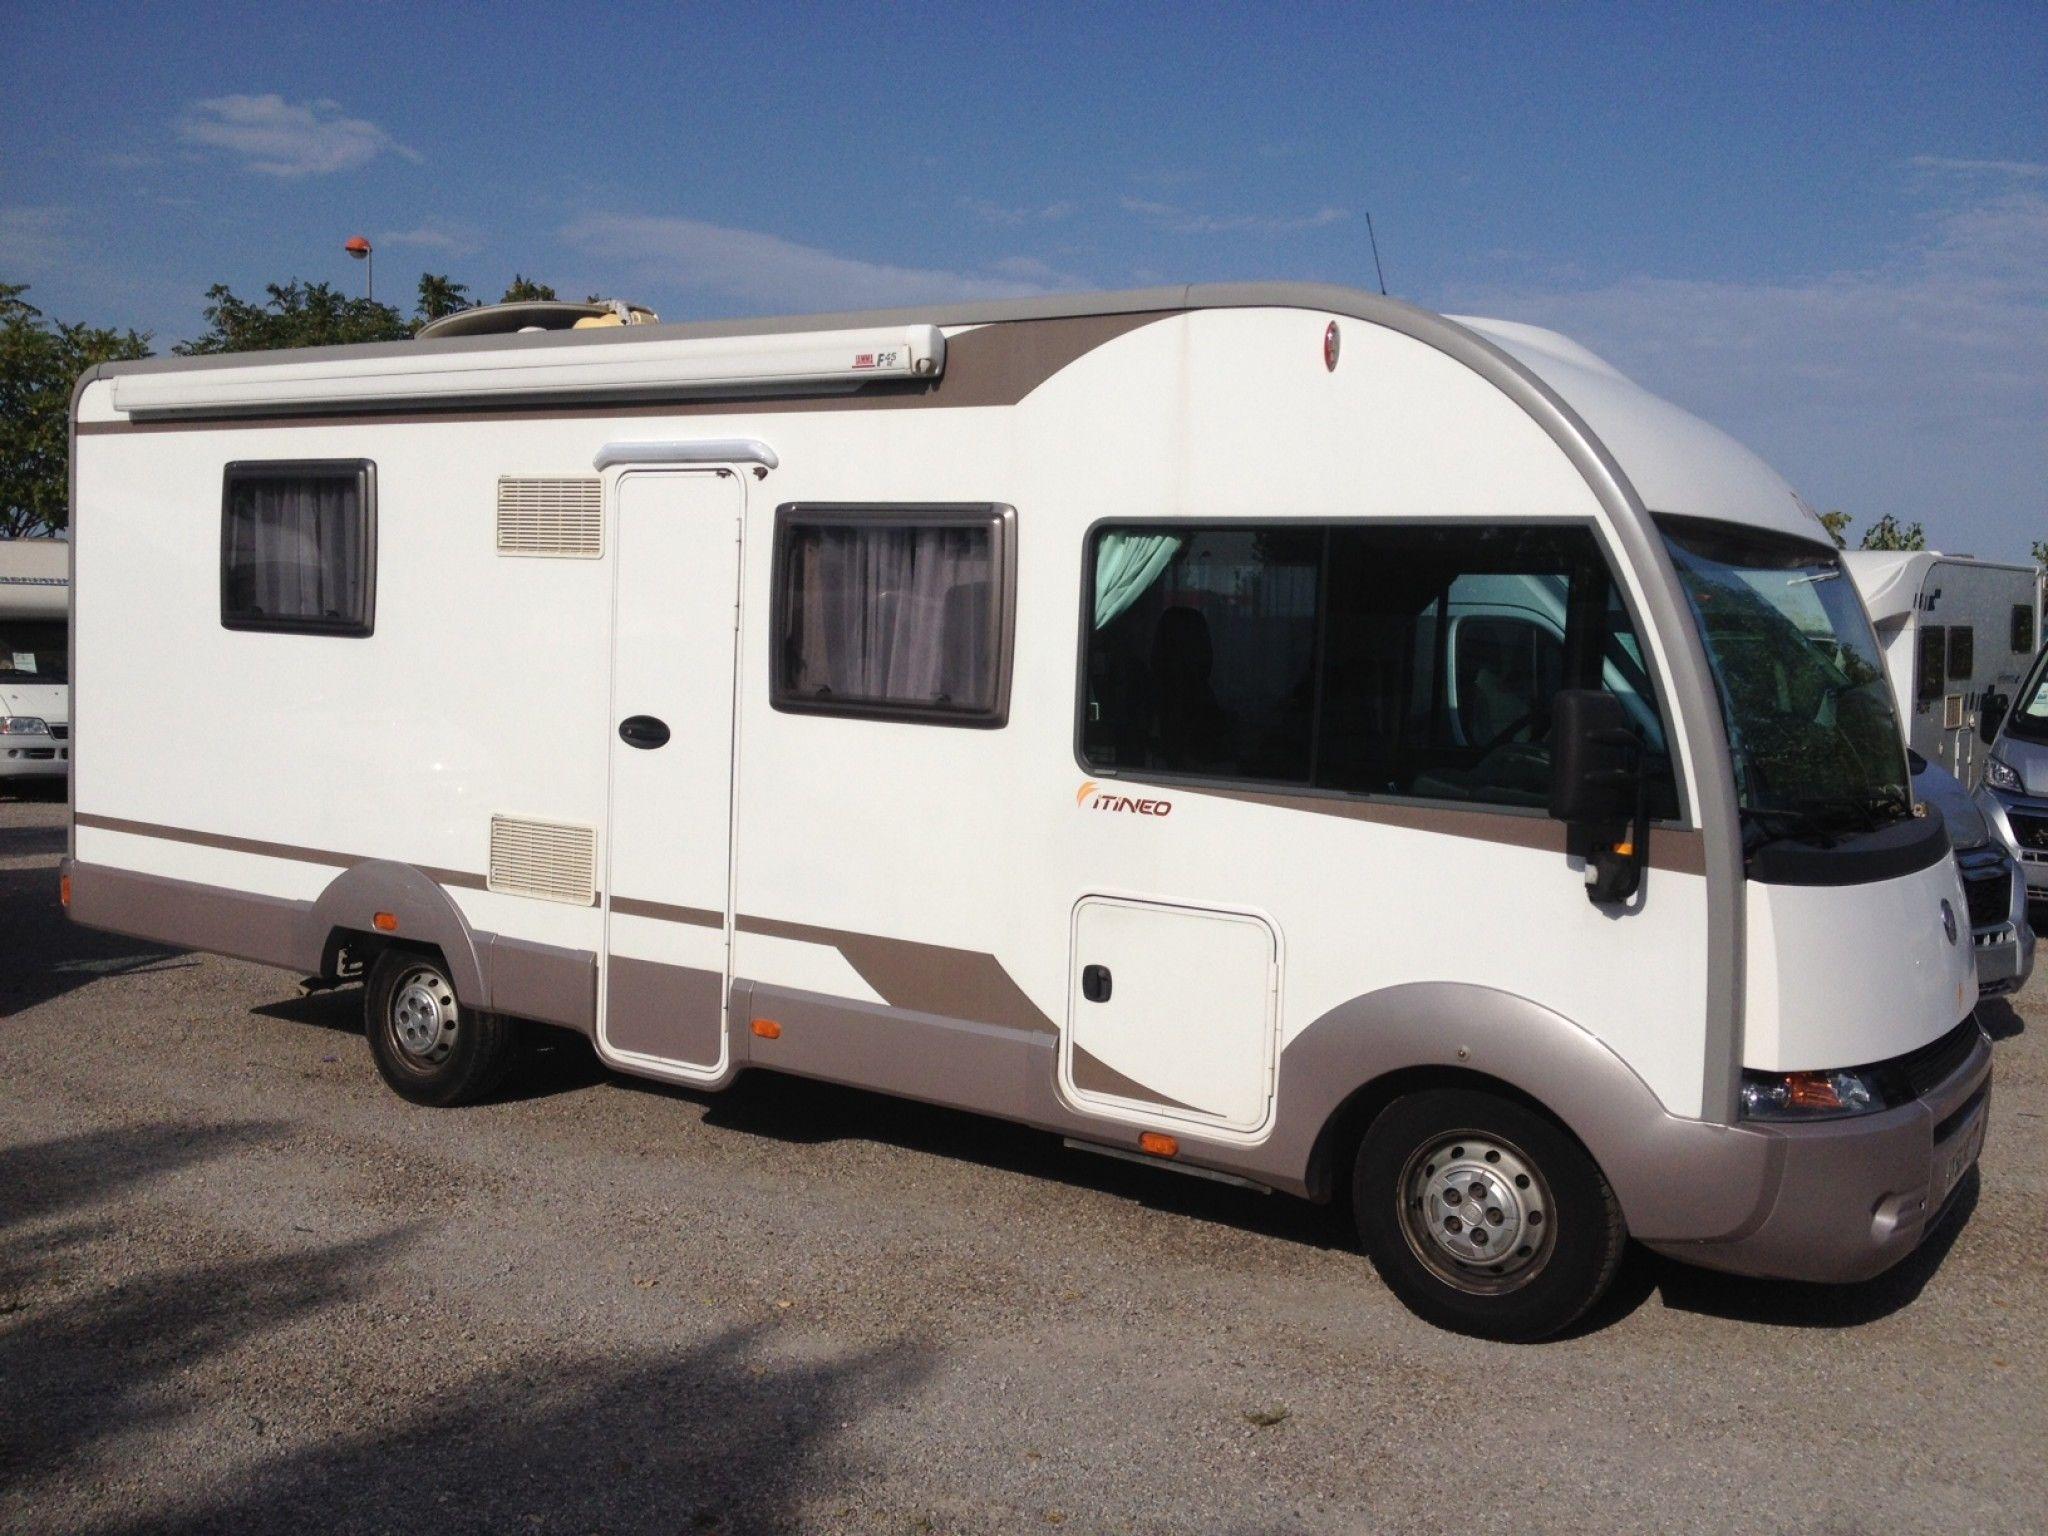 itineo cd 720 occasion de 2008 fiat camping car en vente narbonne aude 11. Black Bedroom Furniture Sets. Home Design Ideas